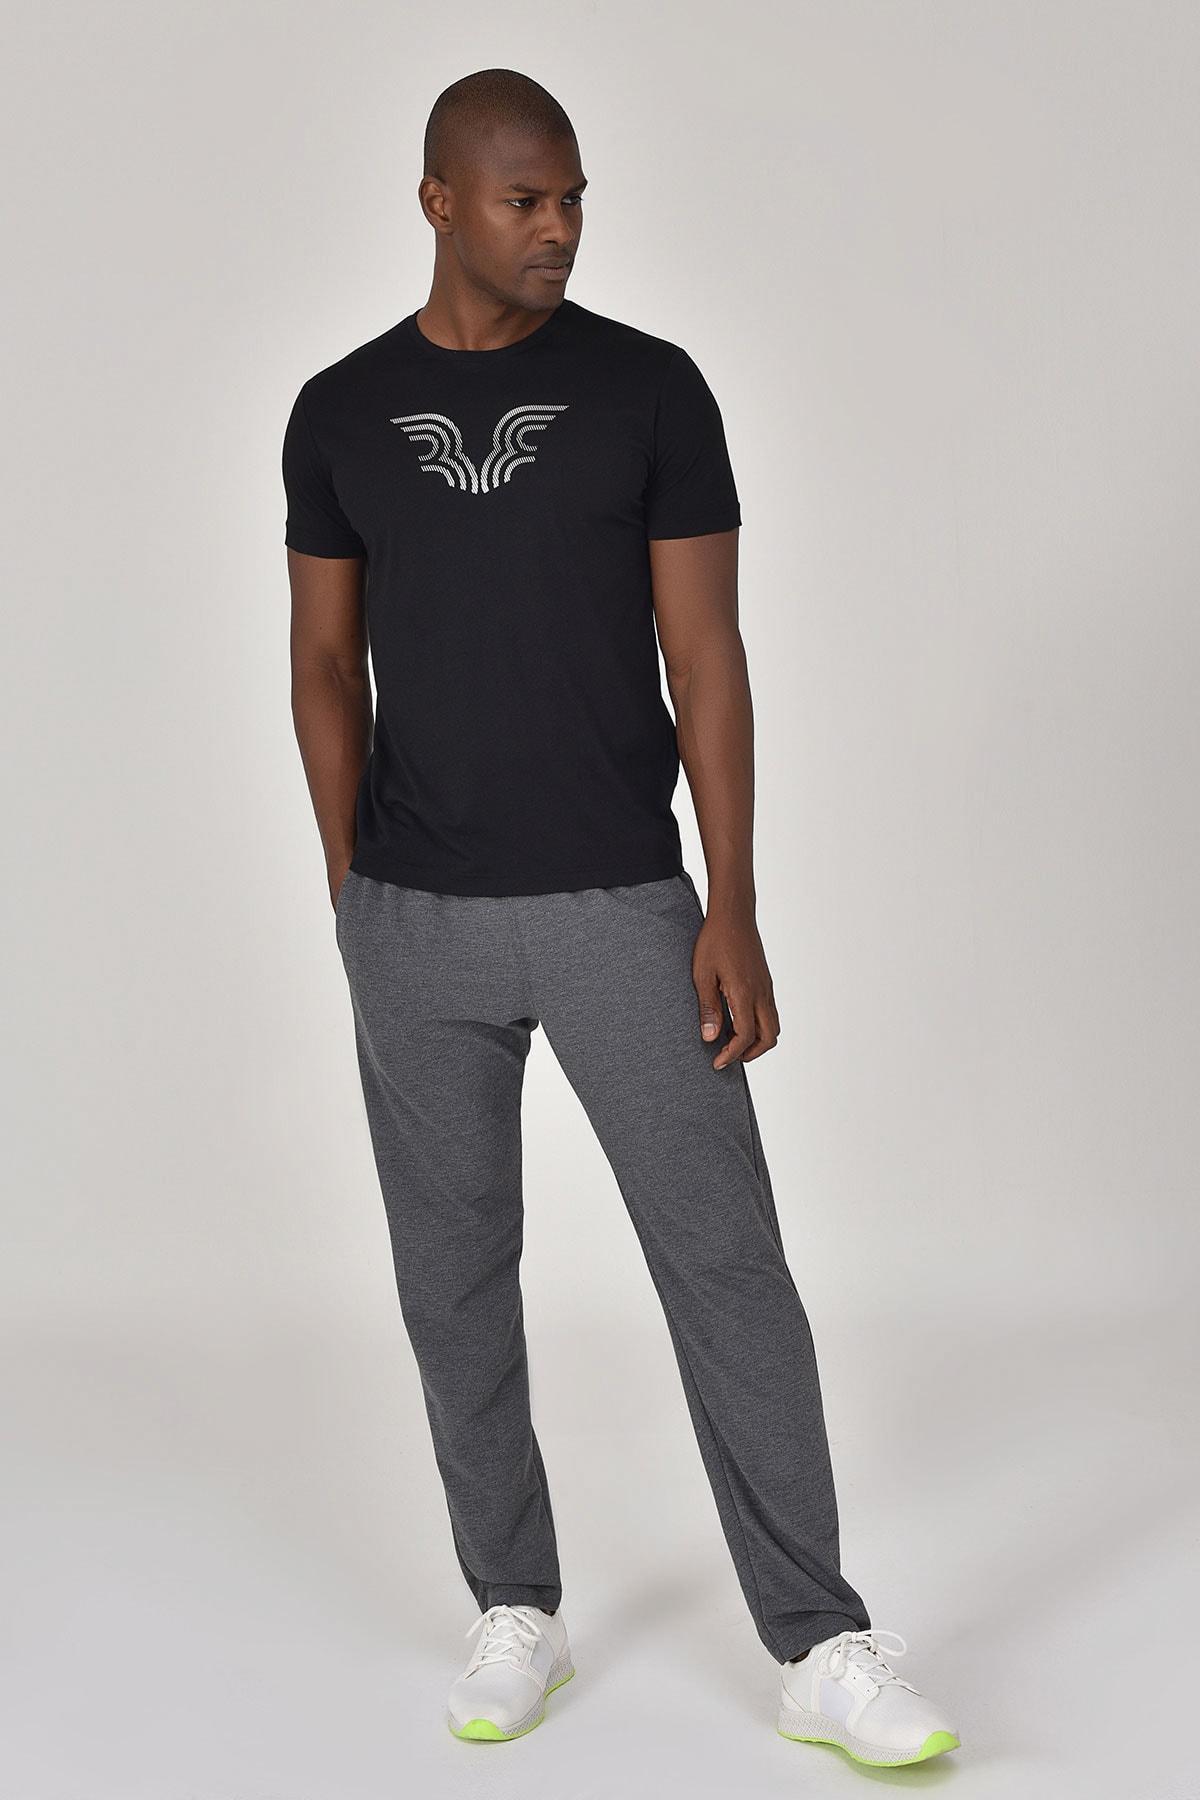 bilcee Siyah Erkek T-shirt  GS-8814 2